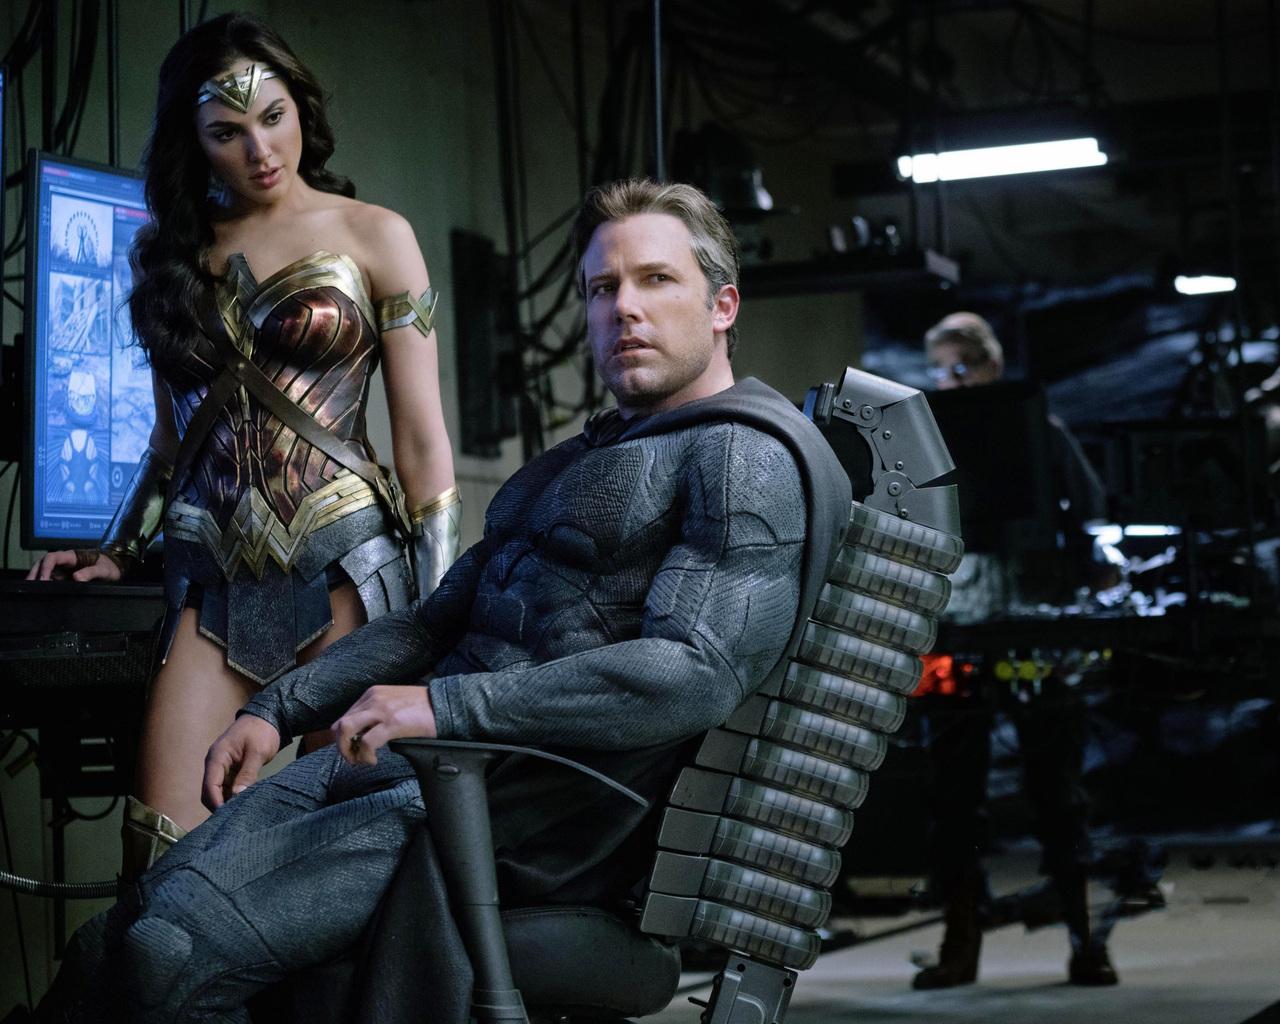 1280x1024 Wonder Woman Movie 1280x1024 Resolution Hd 4k: 1280x1024 Ben Affleck As Batman Gal Gadot Wonder Woman